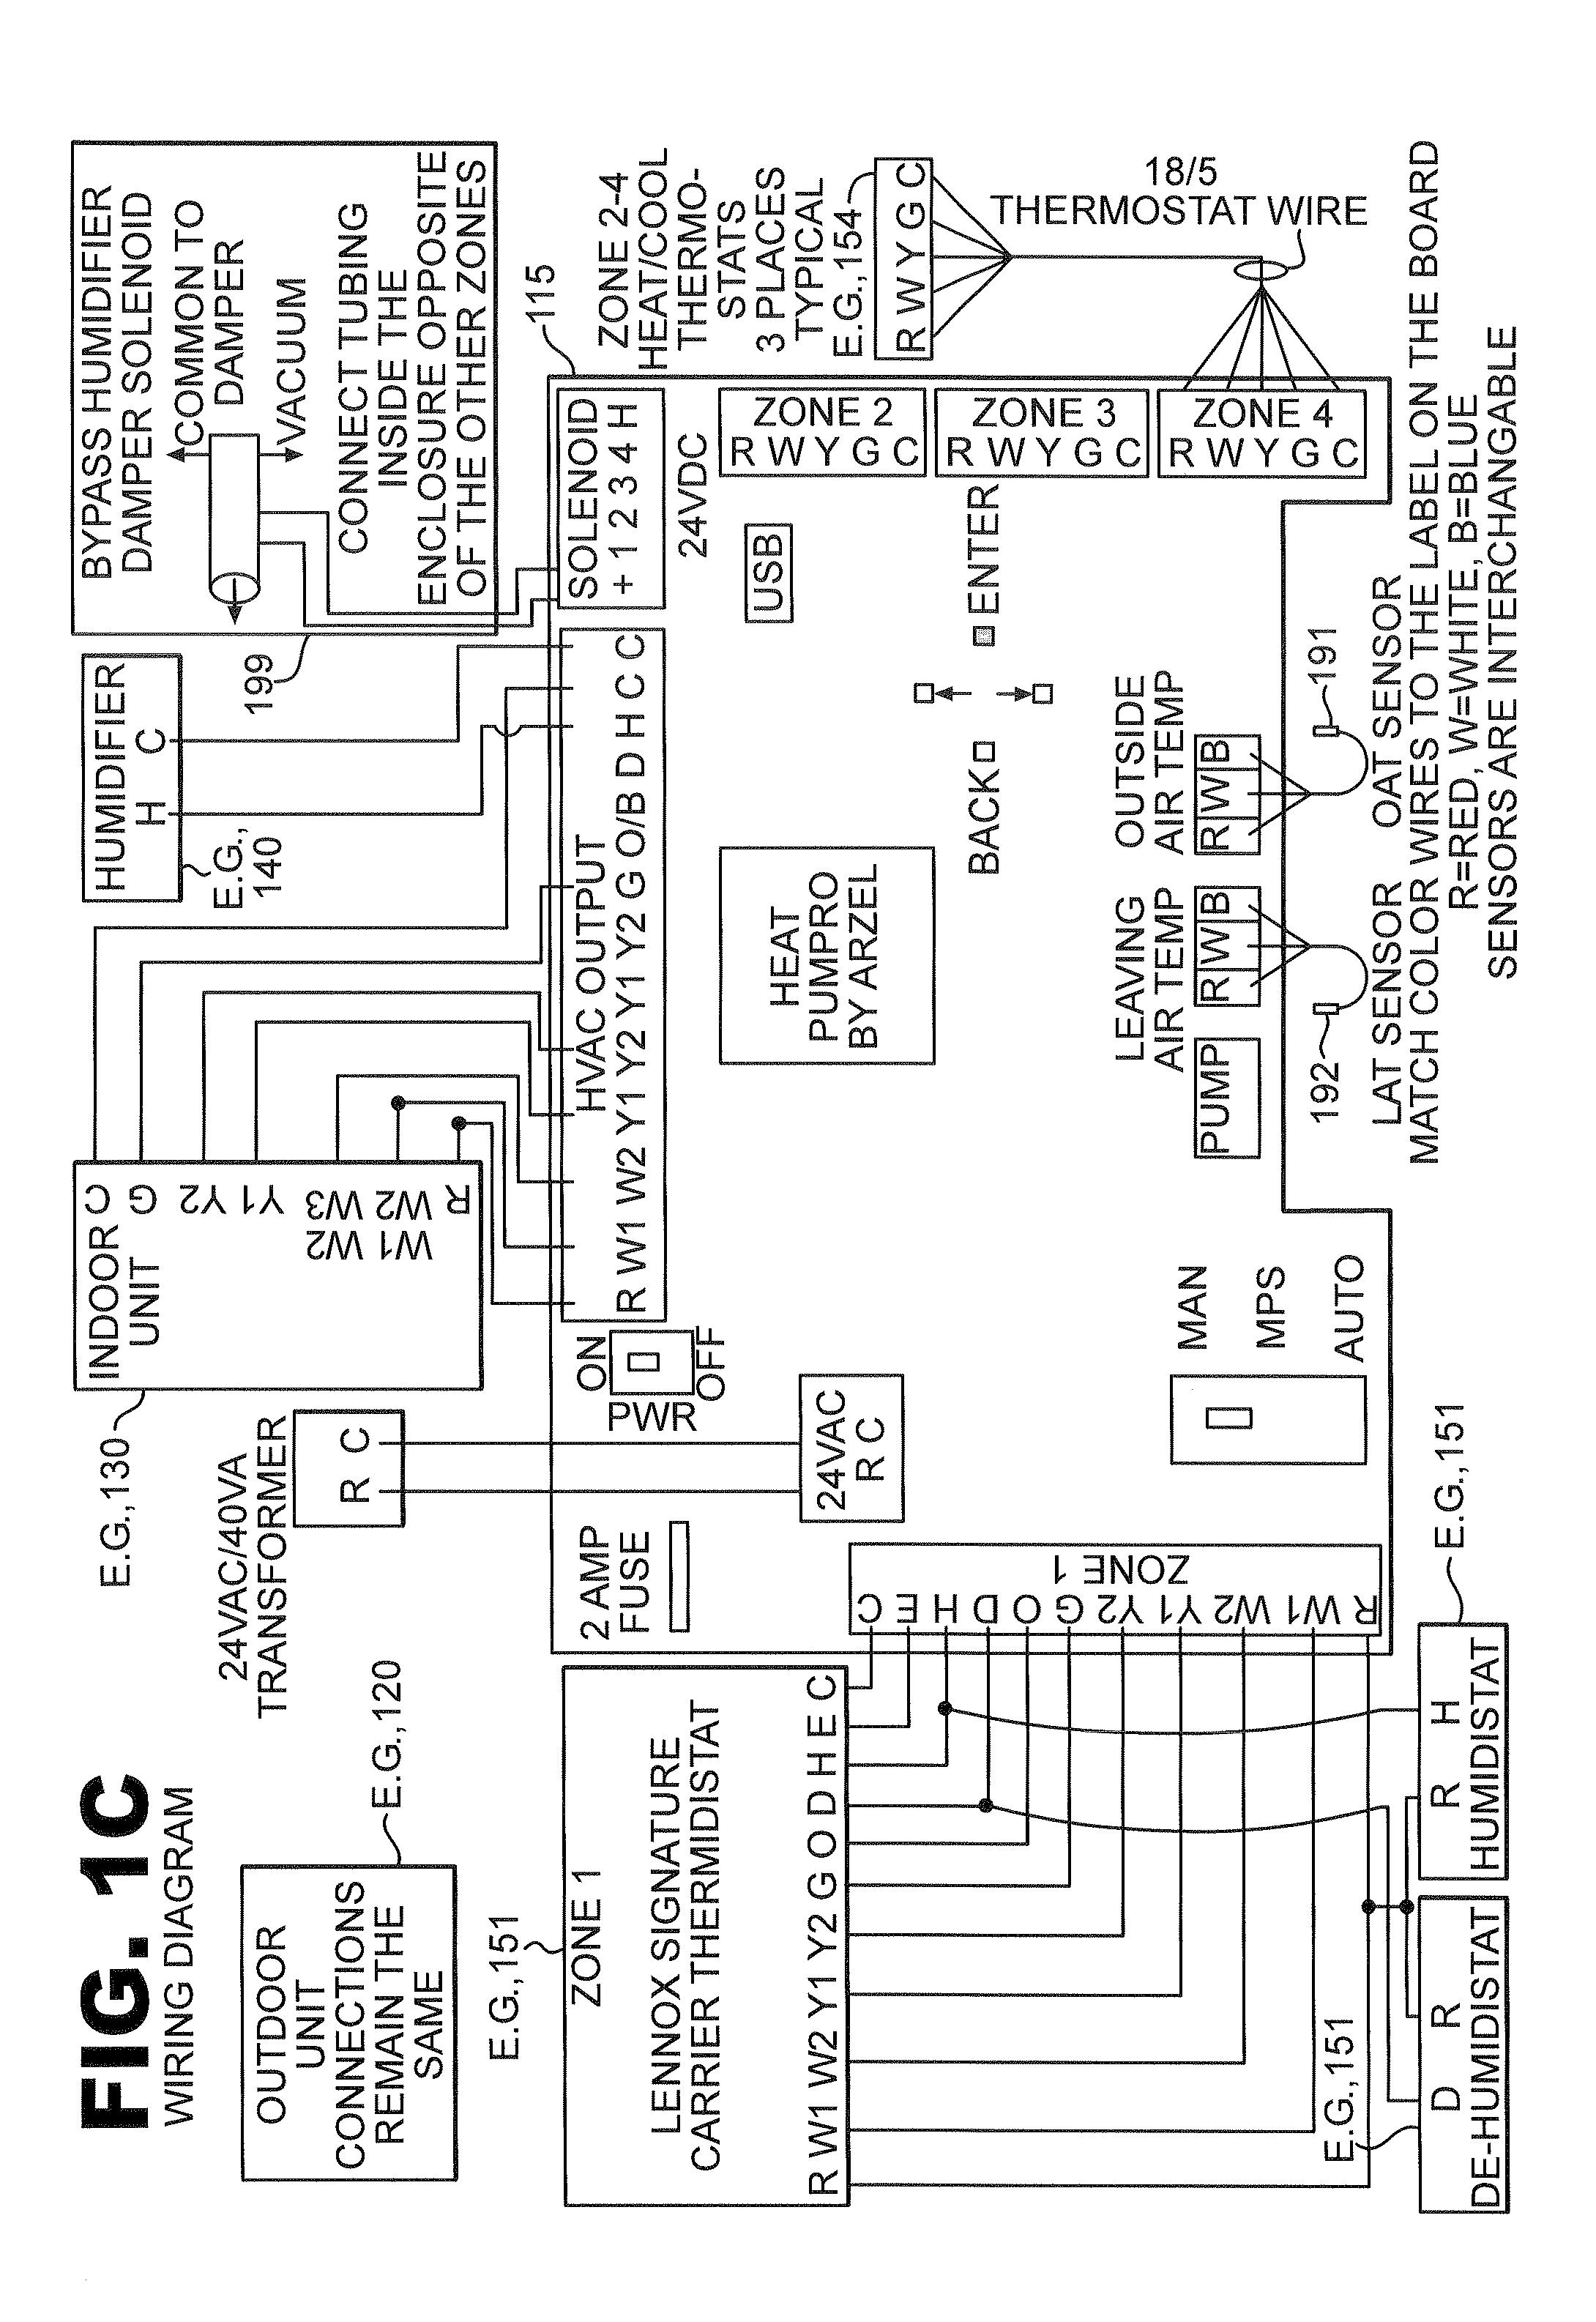 Wiring Diagram For Copeland Compressor Board 580 0041 00